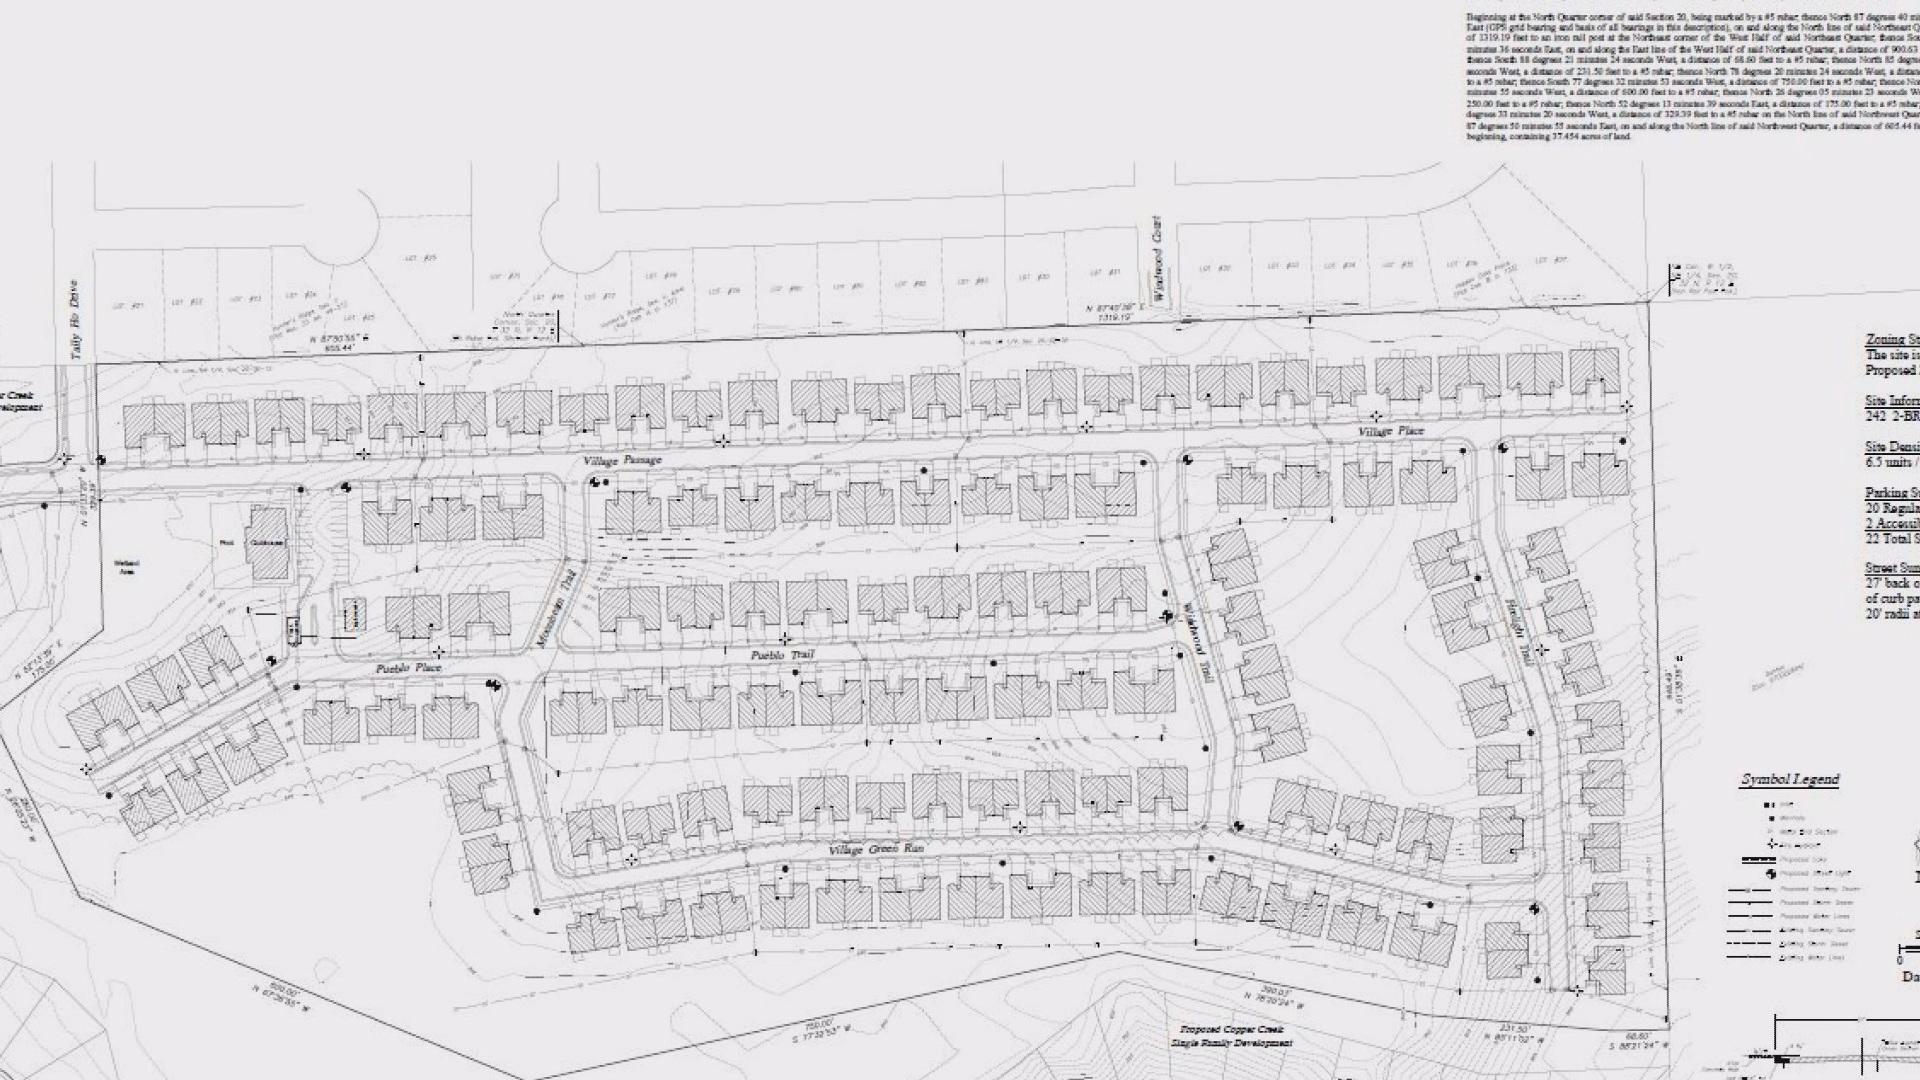 Huntertown housing development project